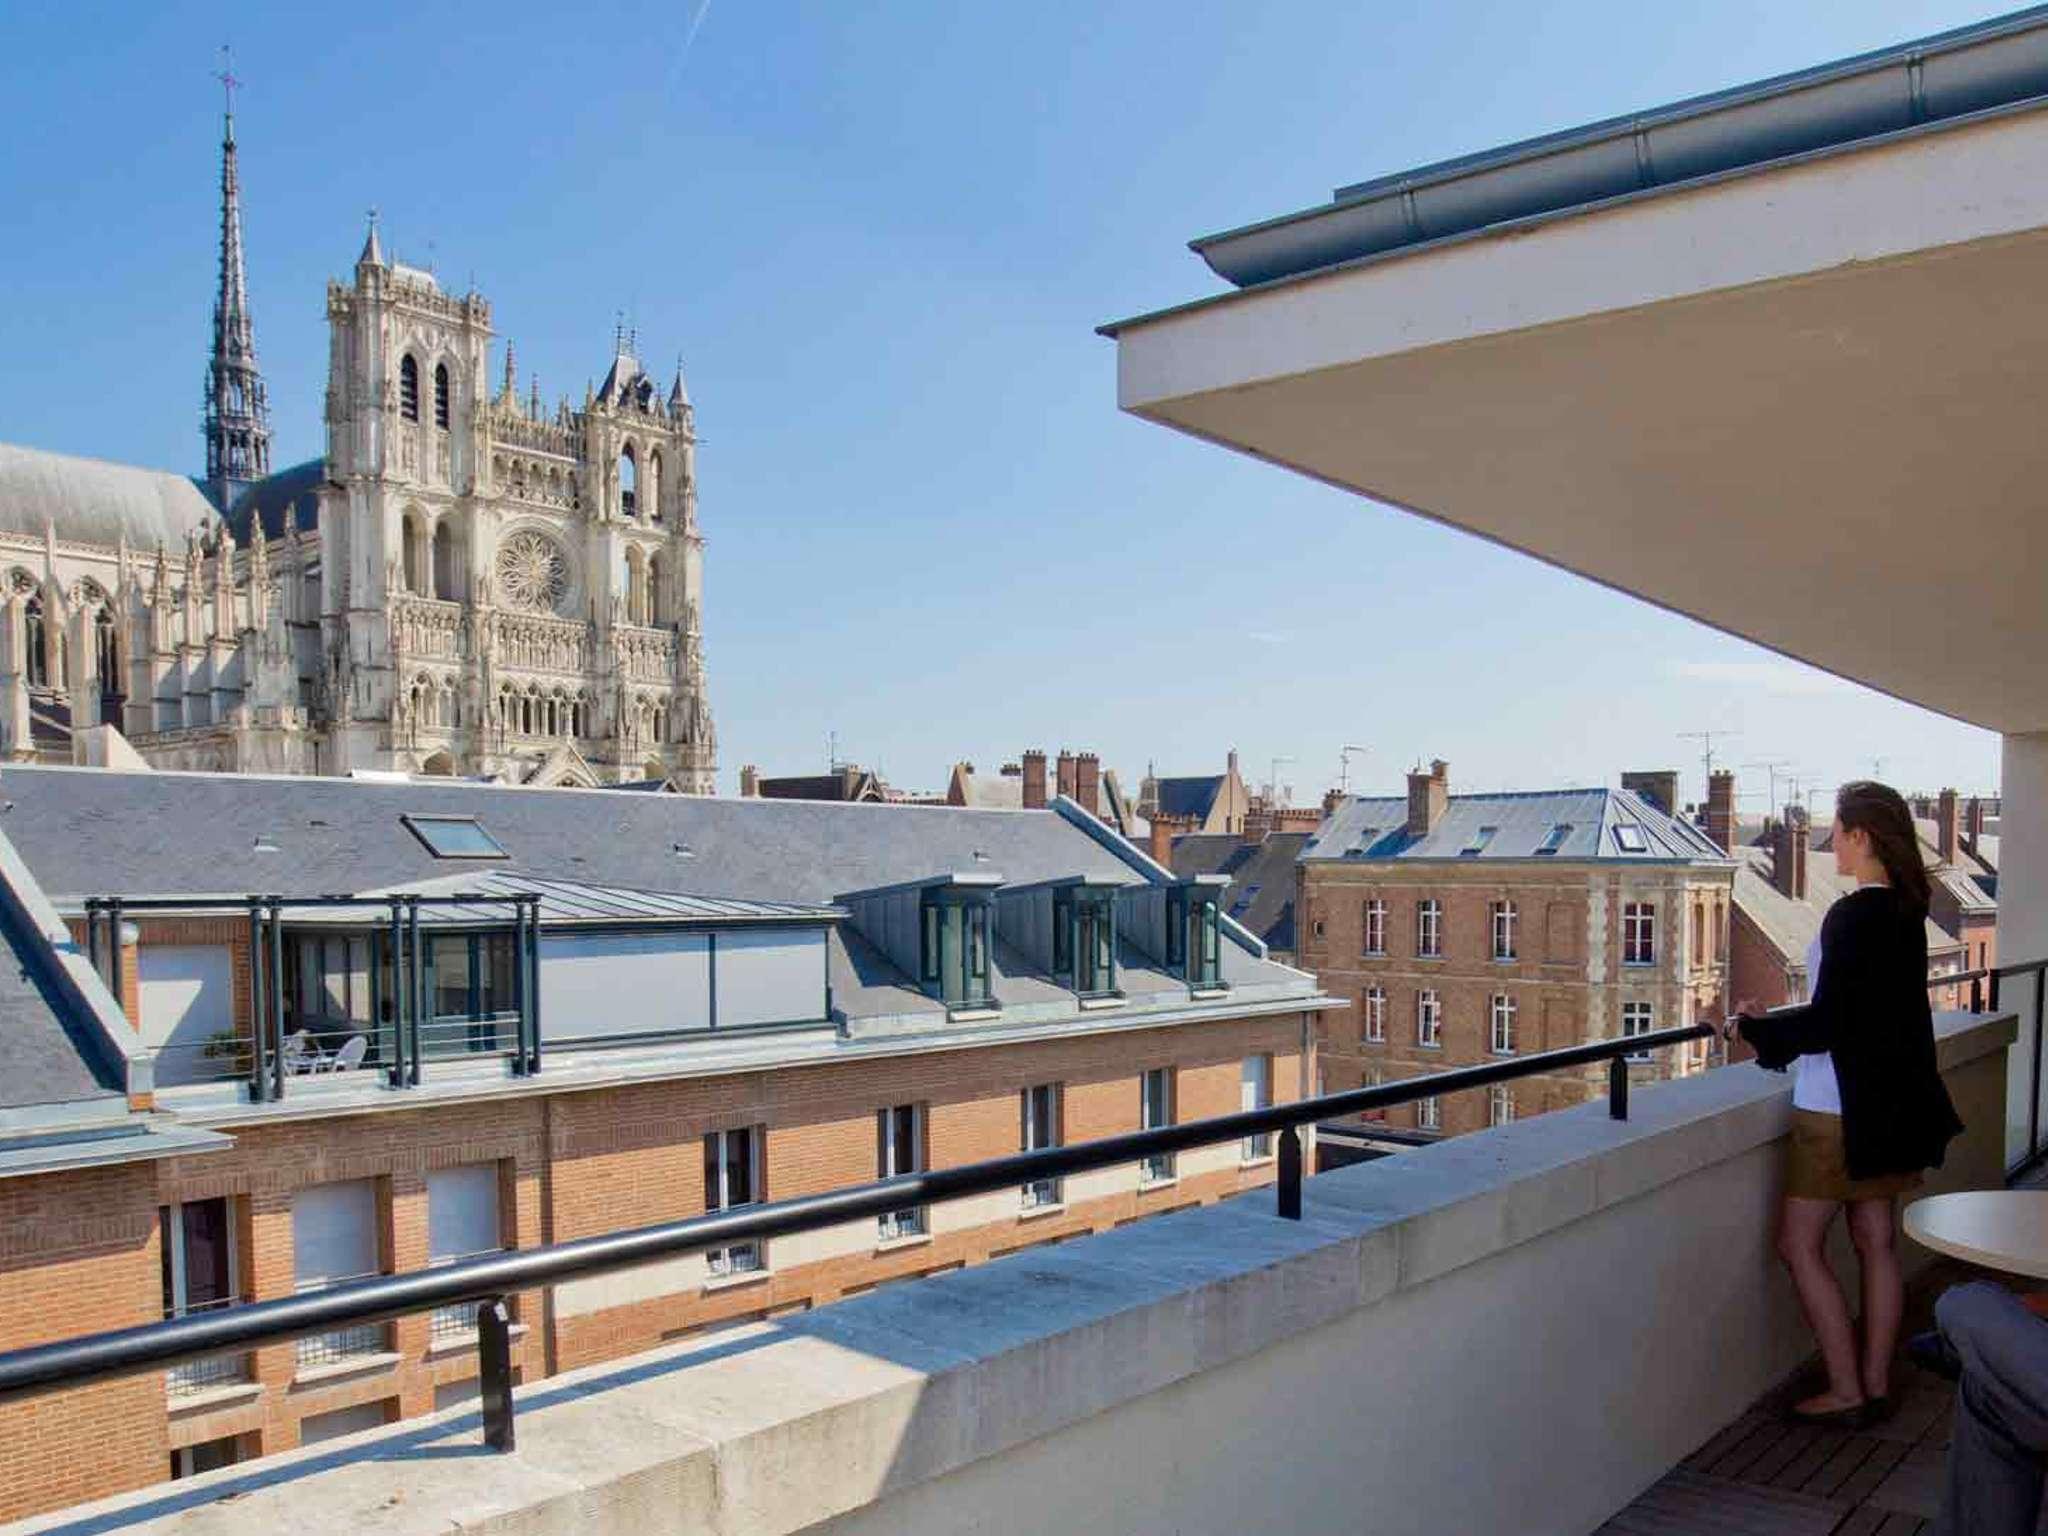 Hotel – Hôtel Mercure Amiens Cathédrale